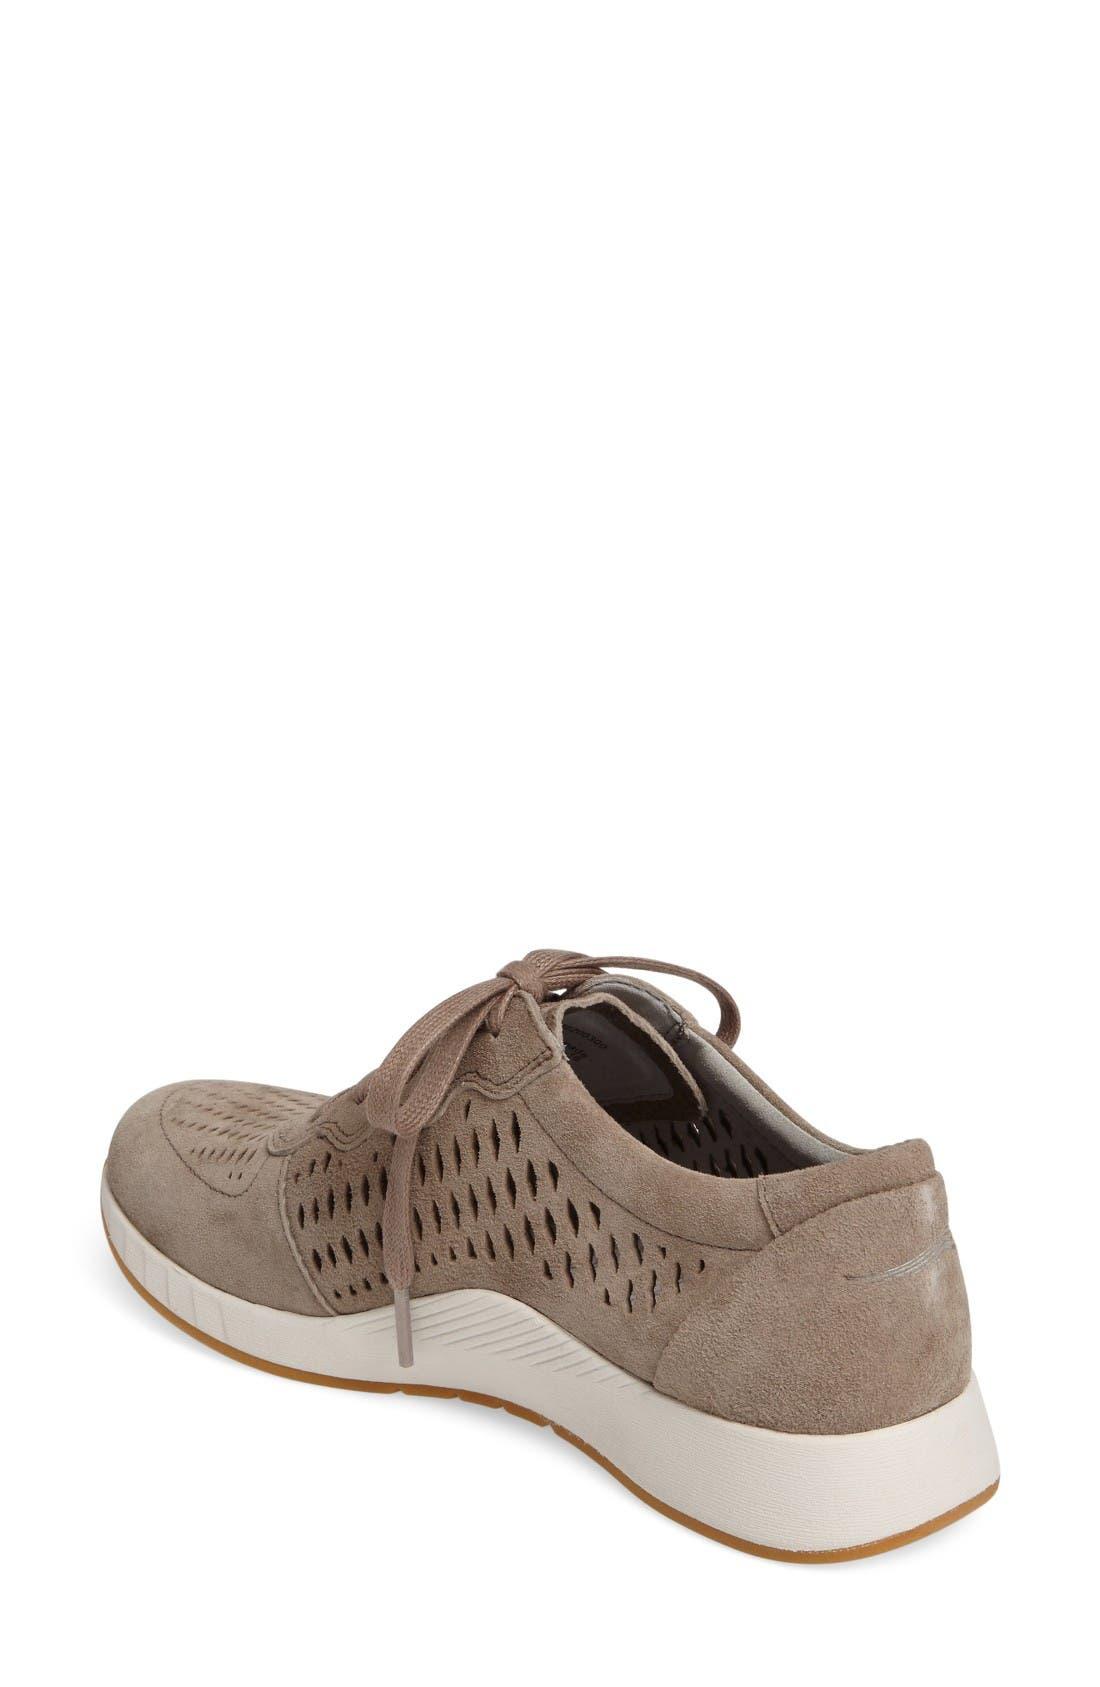 Alternate Image 2  - Dansko Charlie Perforated Sneaker (Women)